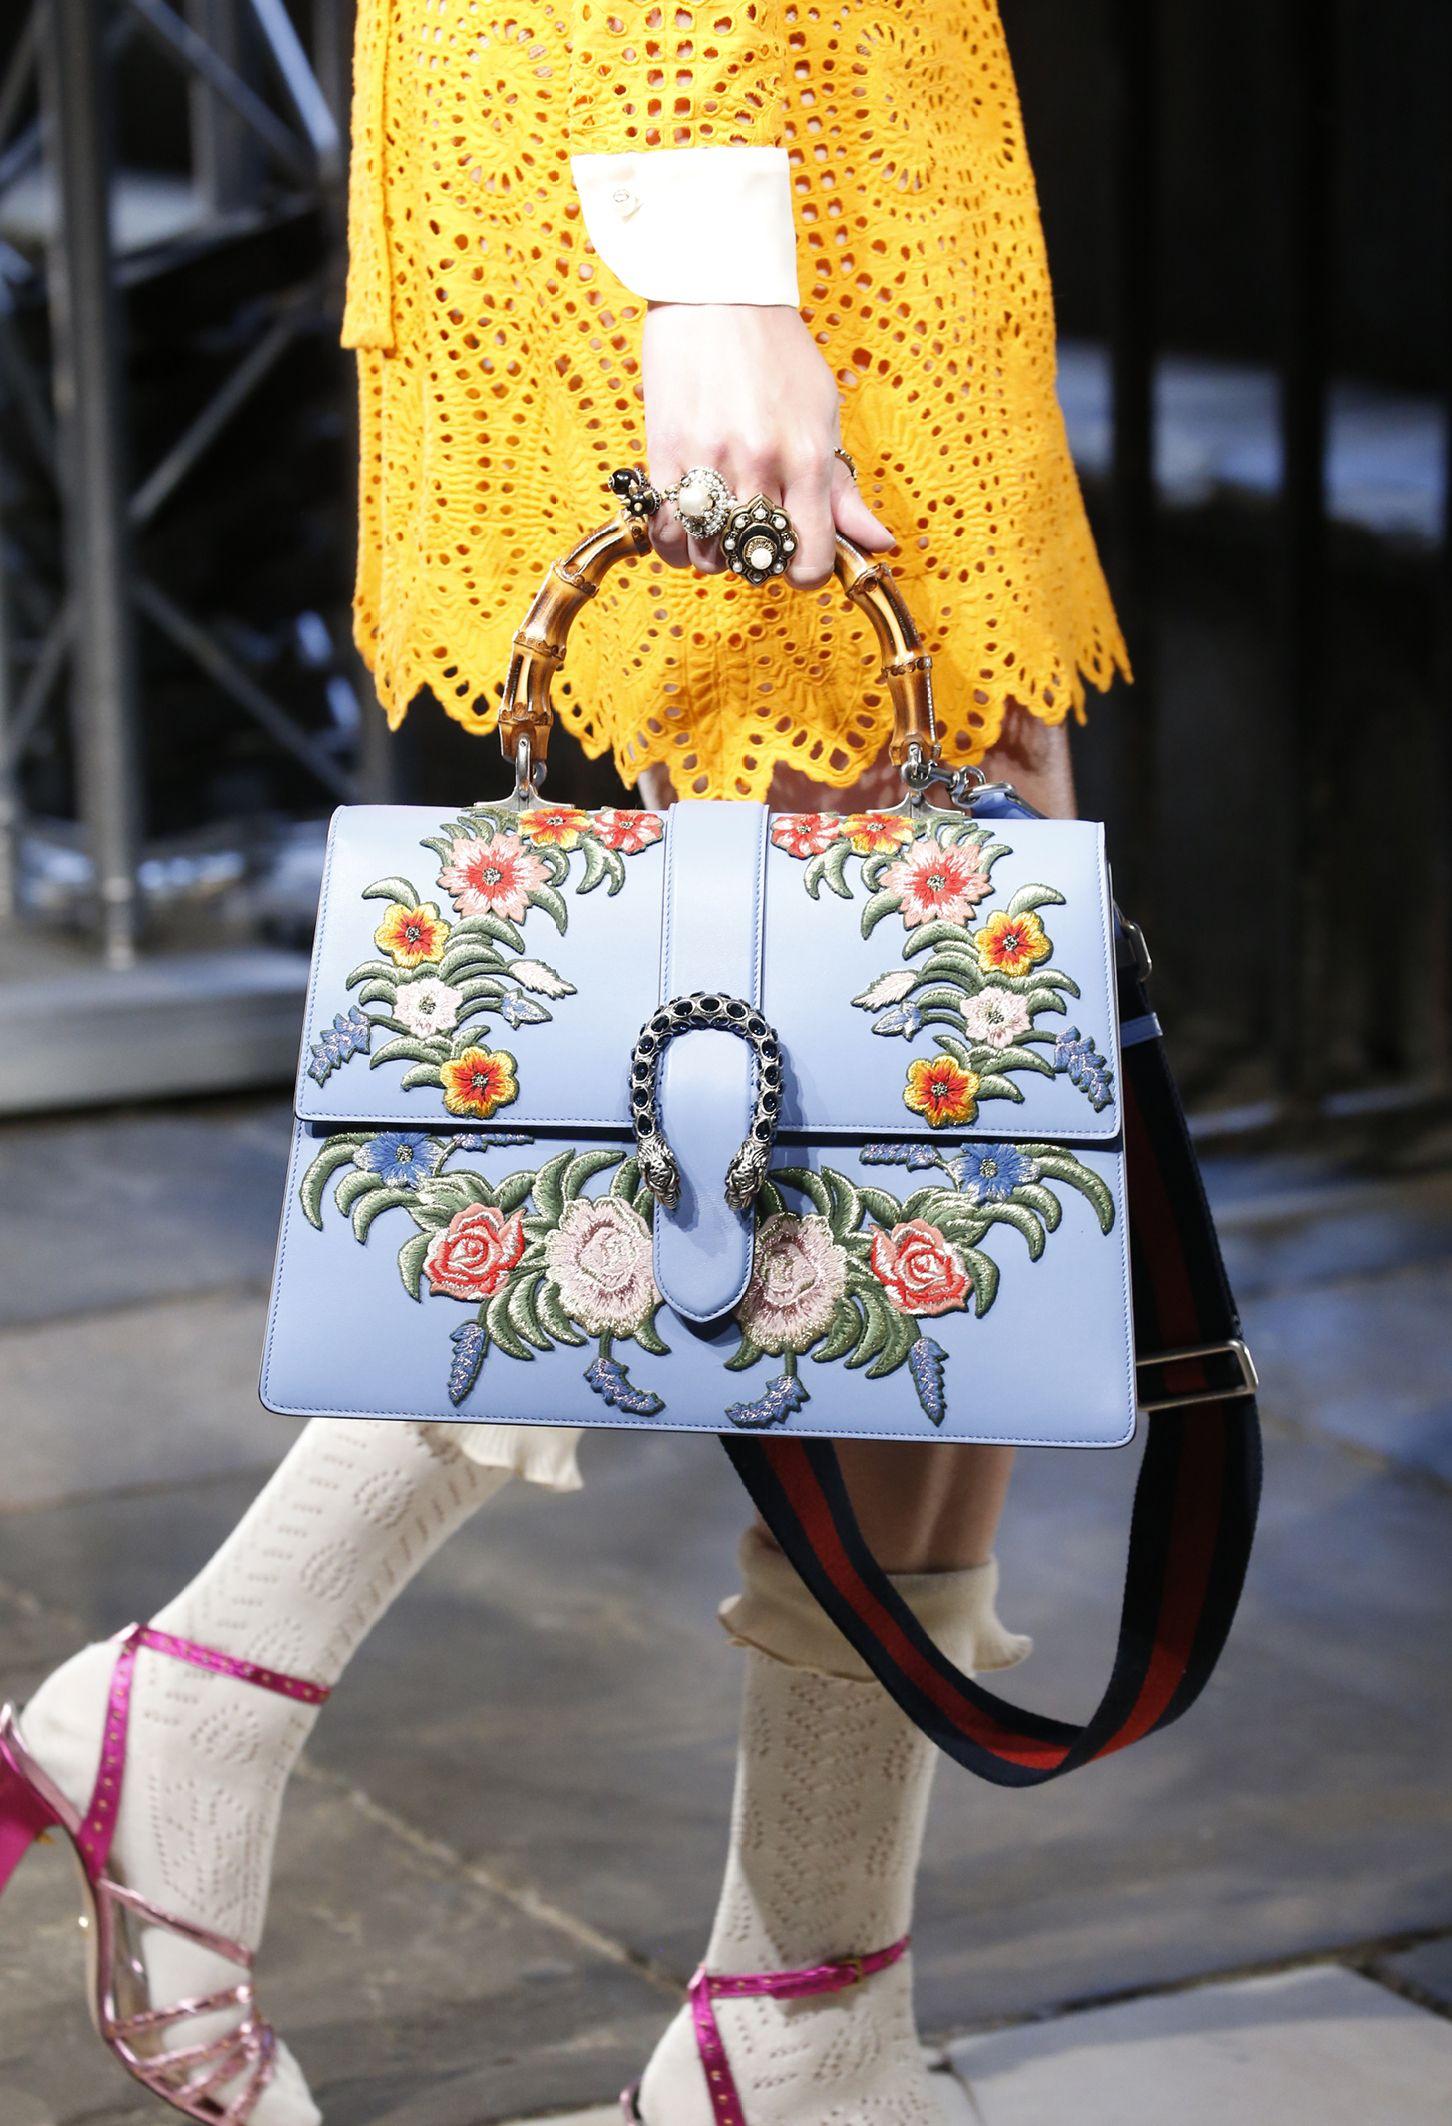 e51a0eeec120 S71 WFS CRUISE Imm LB CLOSE UP300 10 Fashion Bags